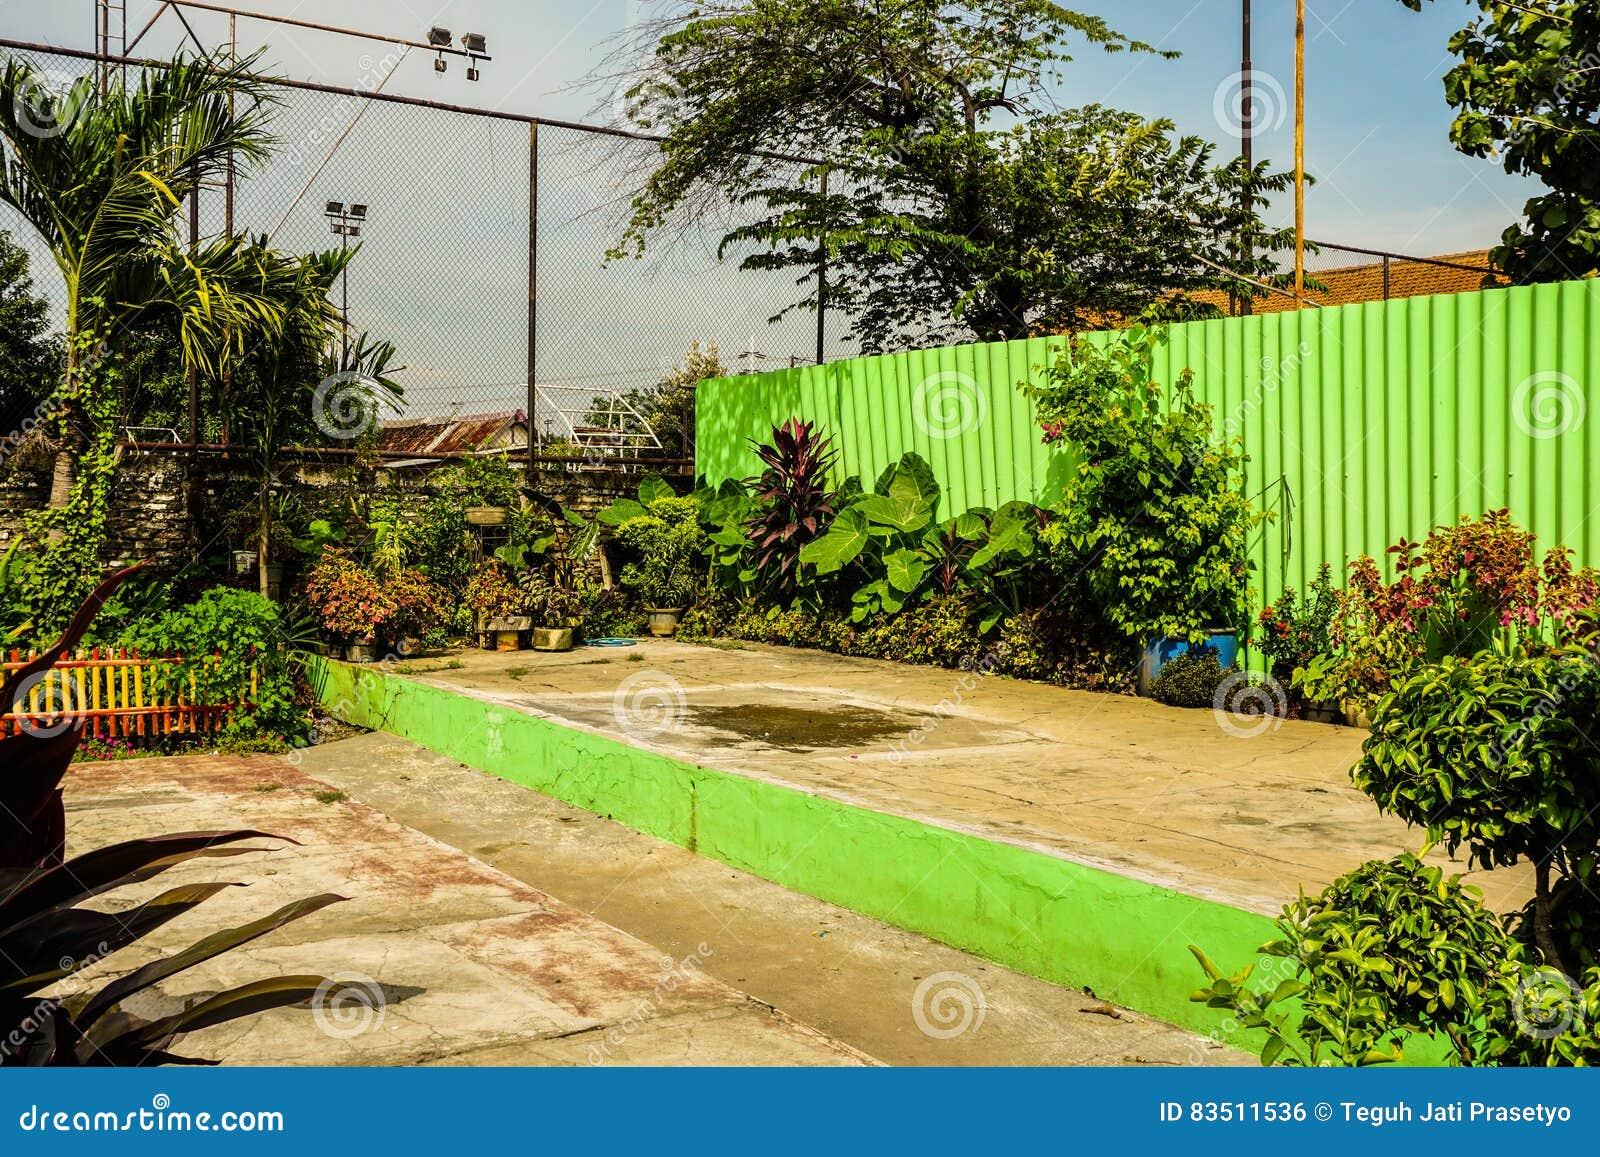 Binnenplaats met mooie tuin en een groene die muurfoto in Semarang Indonesië wordt genomen